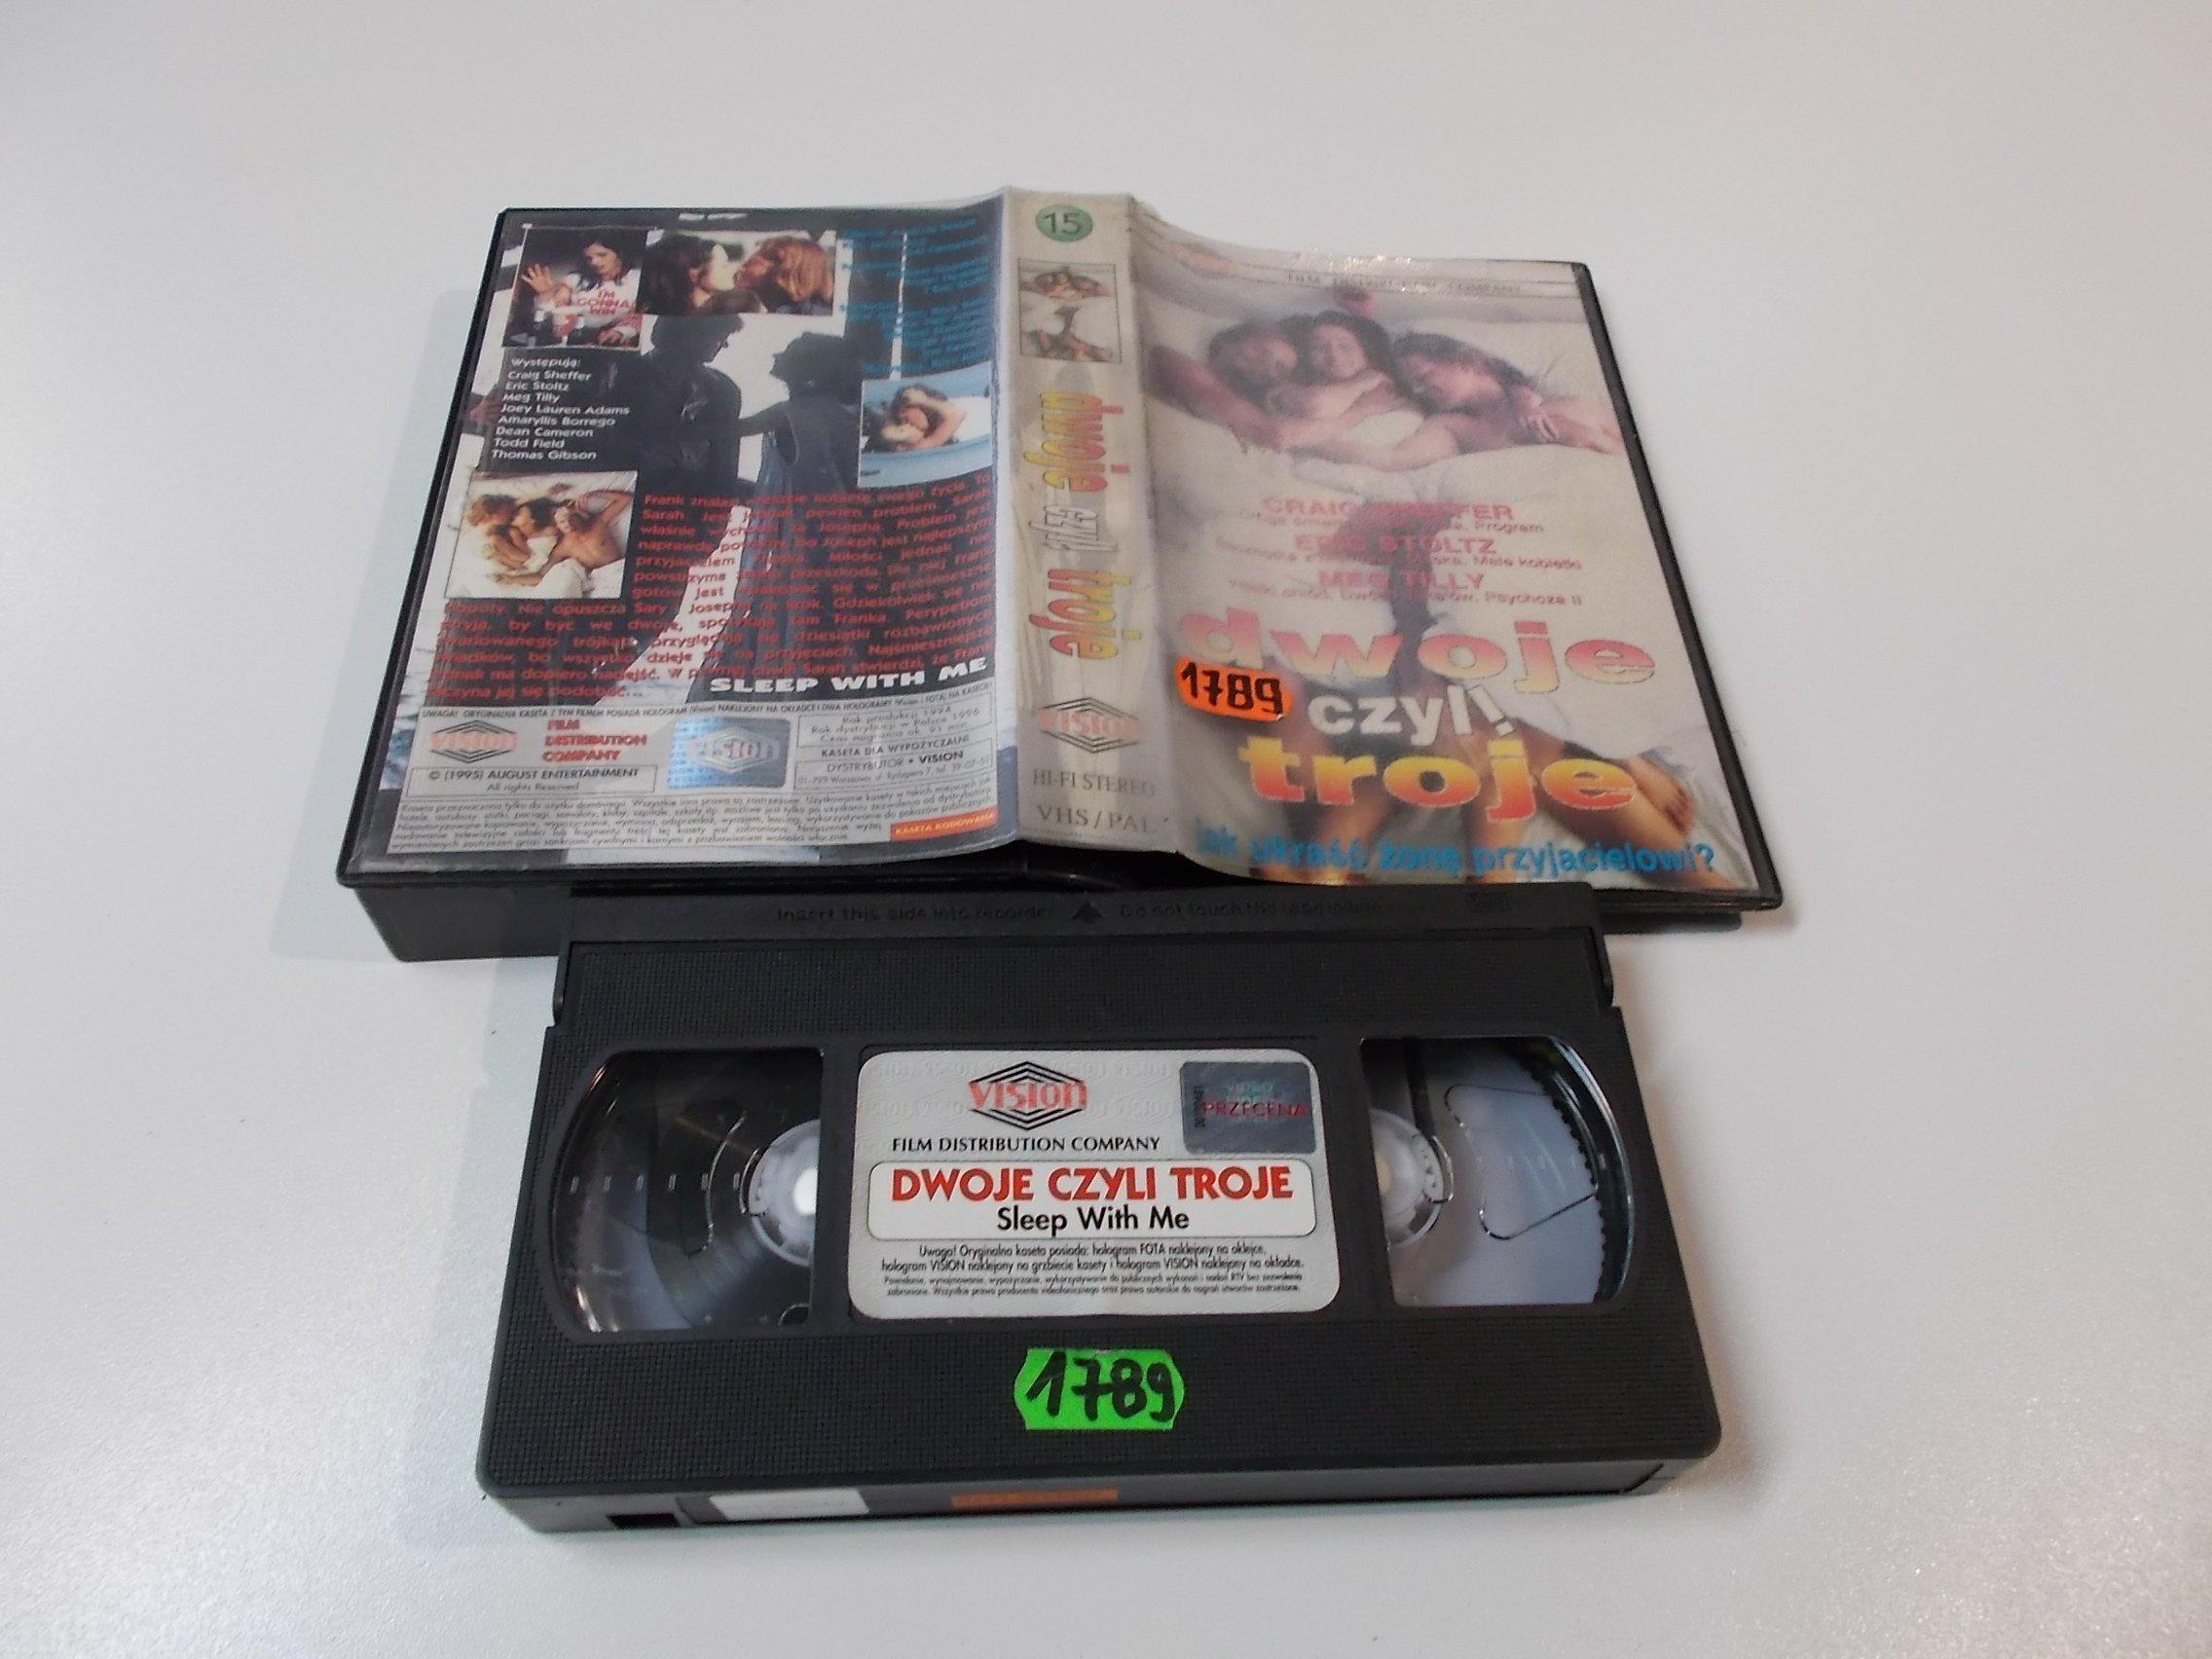 DWOJE CZYLI TROJE - Kaseta Video VHS - Opole 1521